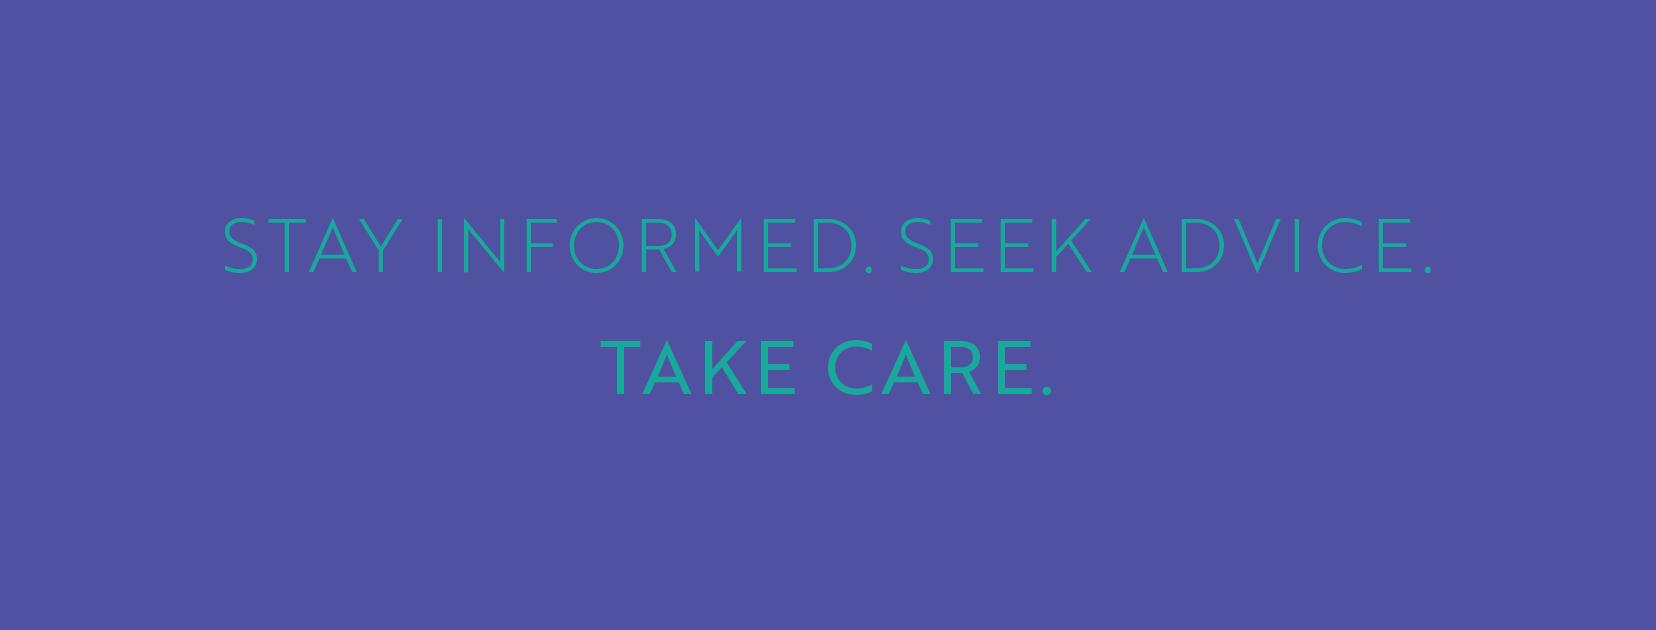 StayInformed-SeekAdvice-TakeCare_1